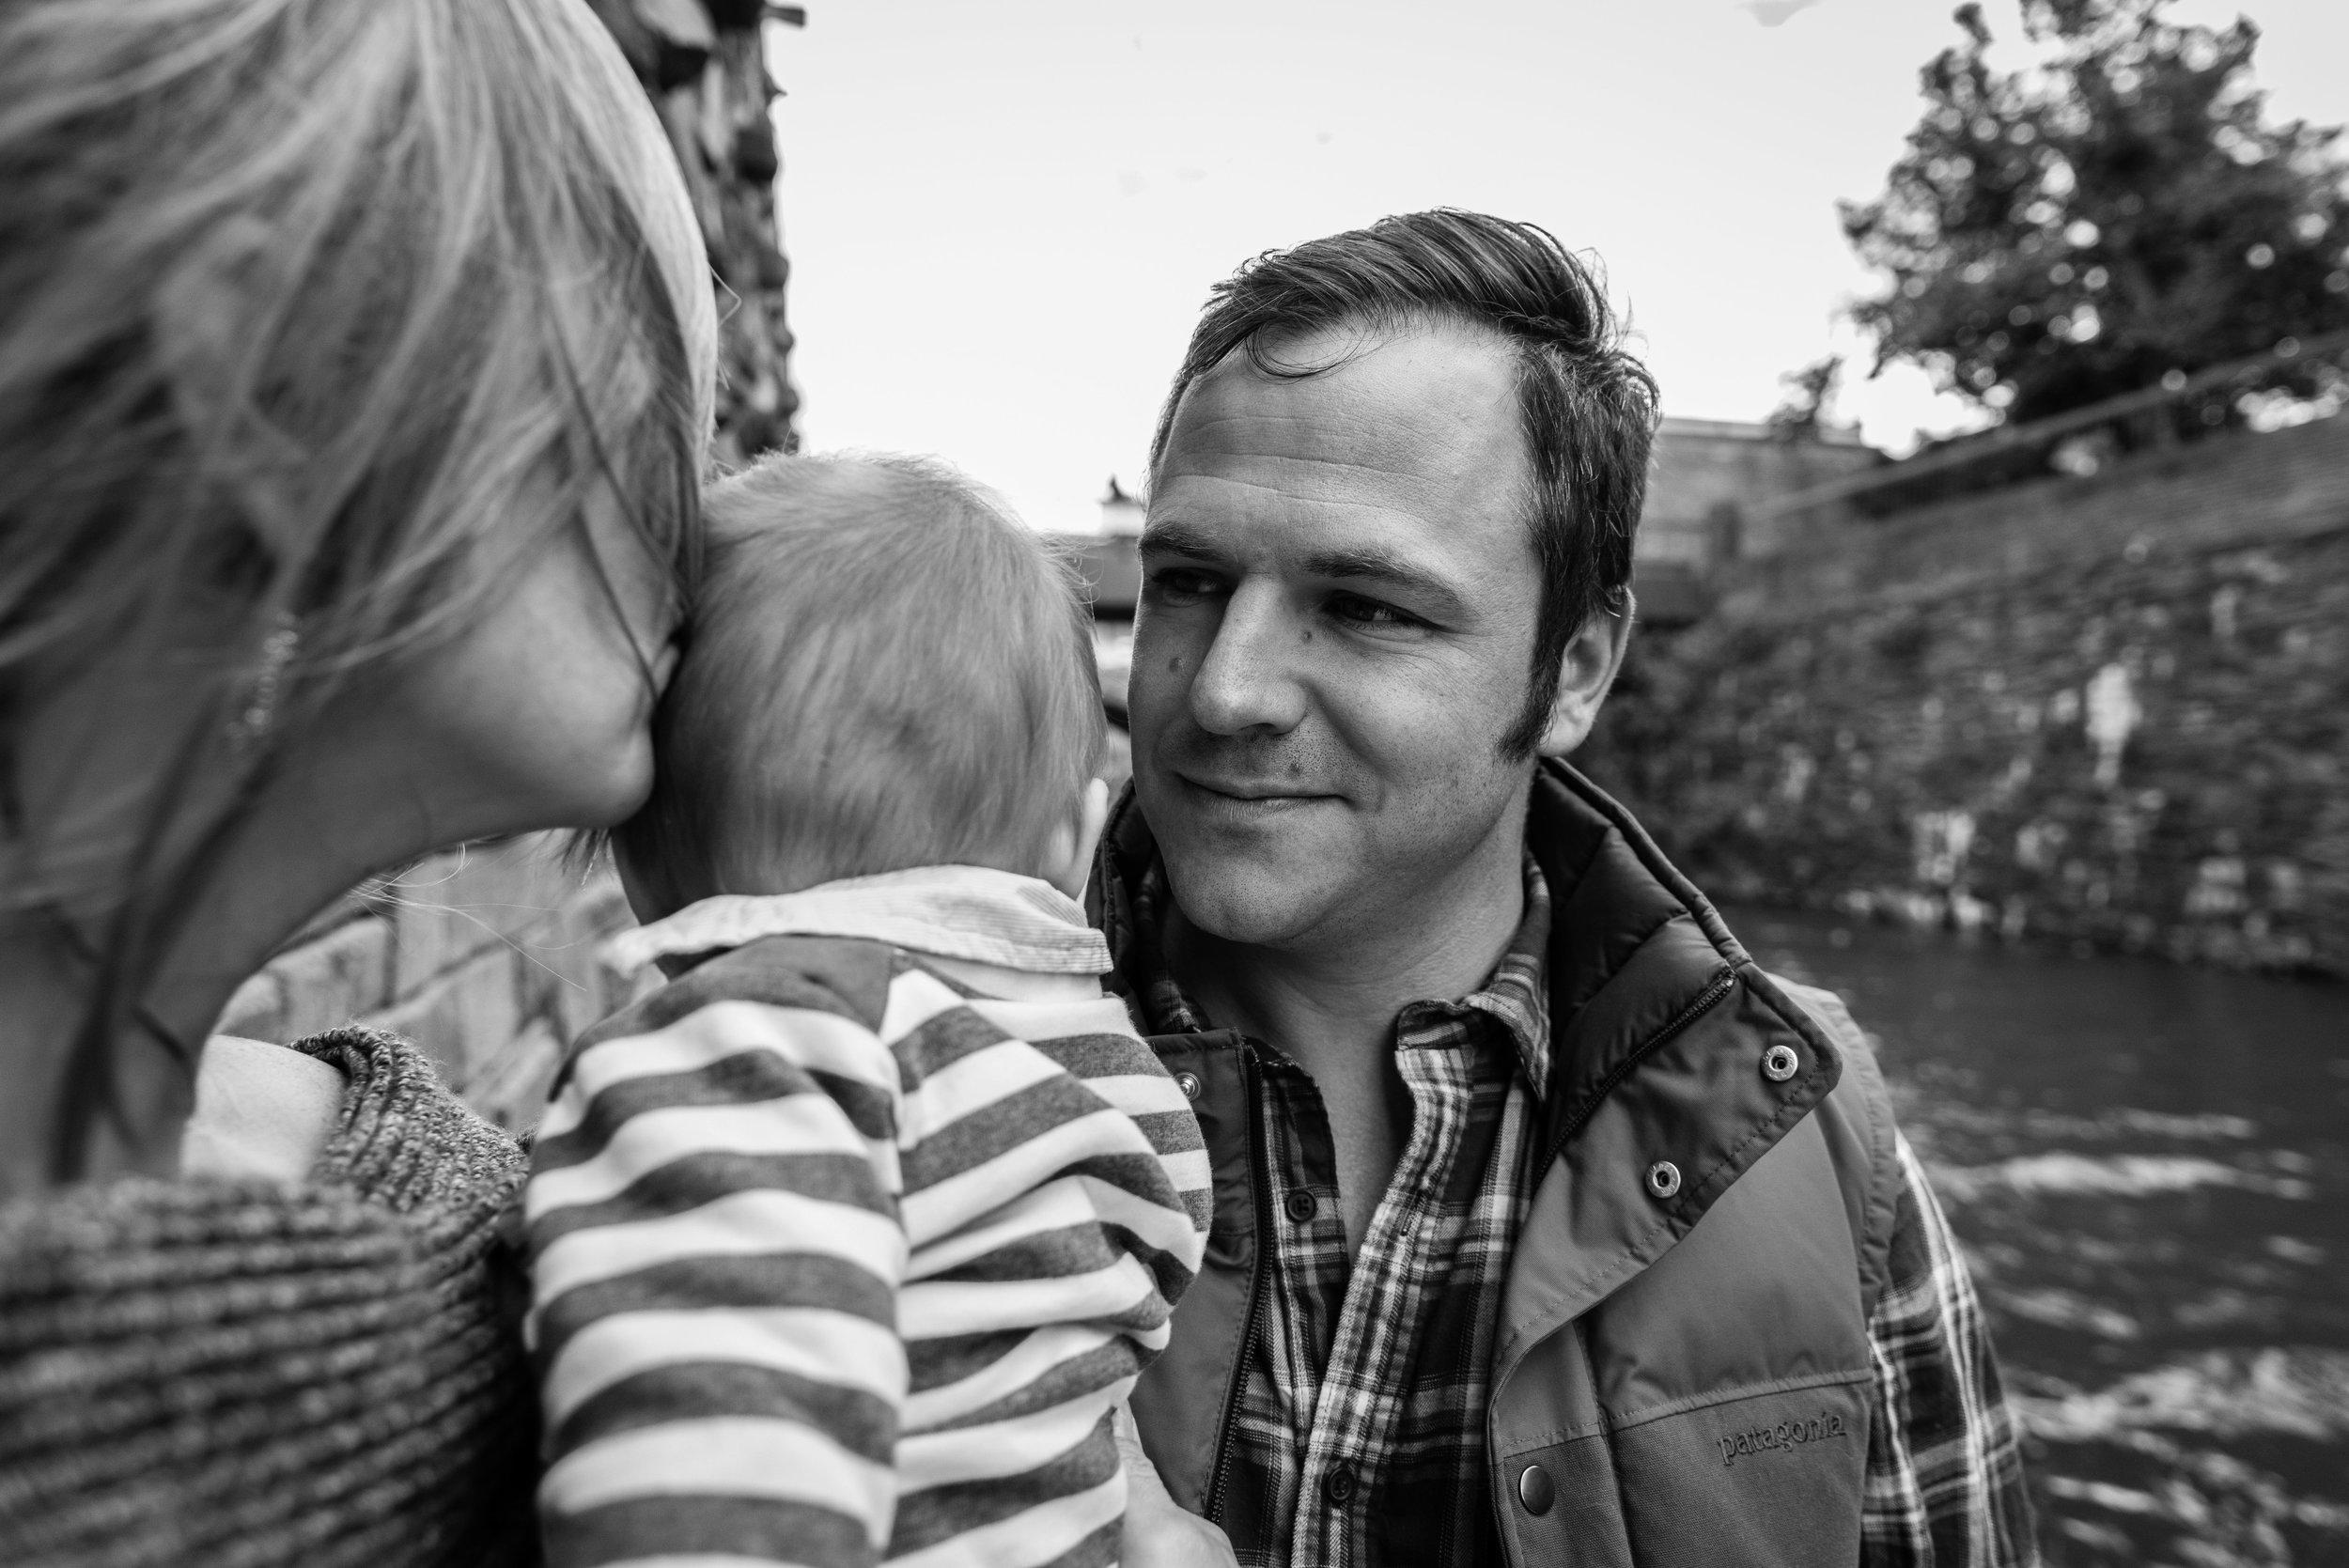 outdoor-urban-documentary-family-session-nicole-sanchez-washington-dc-family-photographer-4.jpg